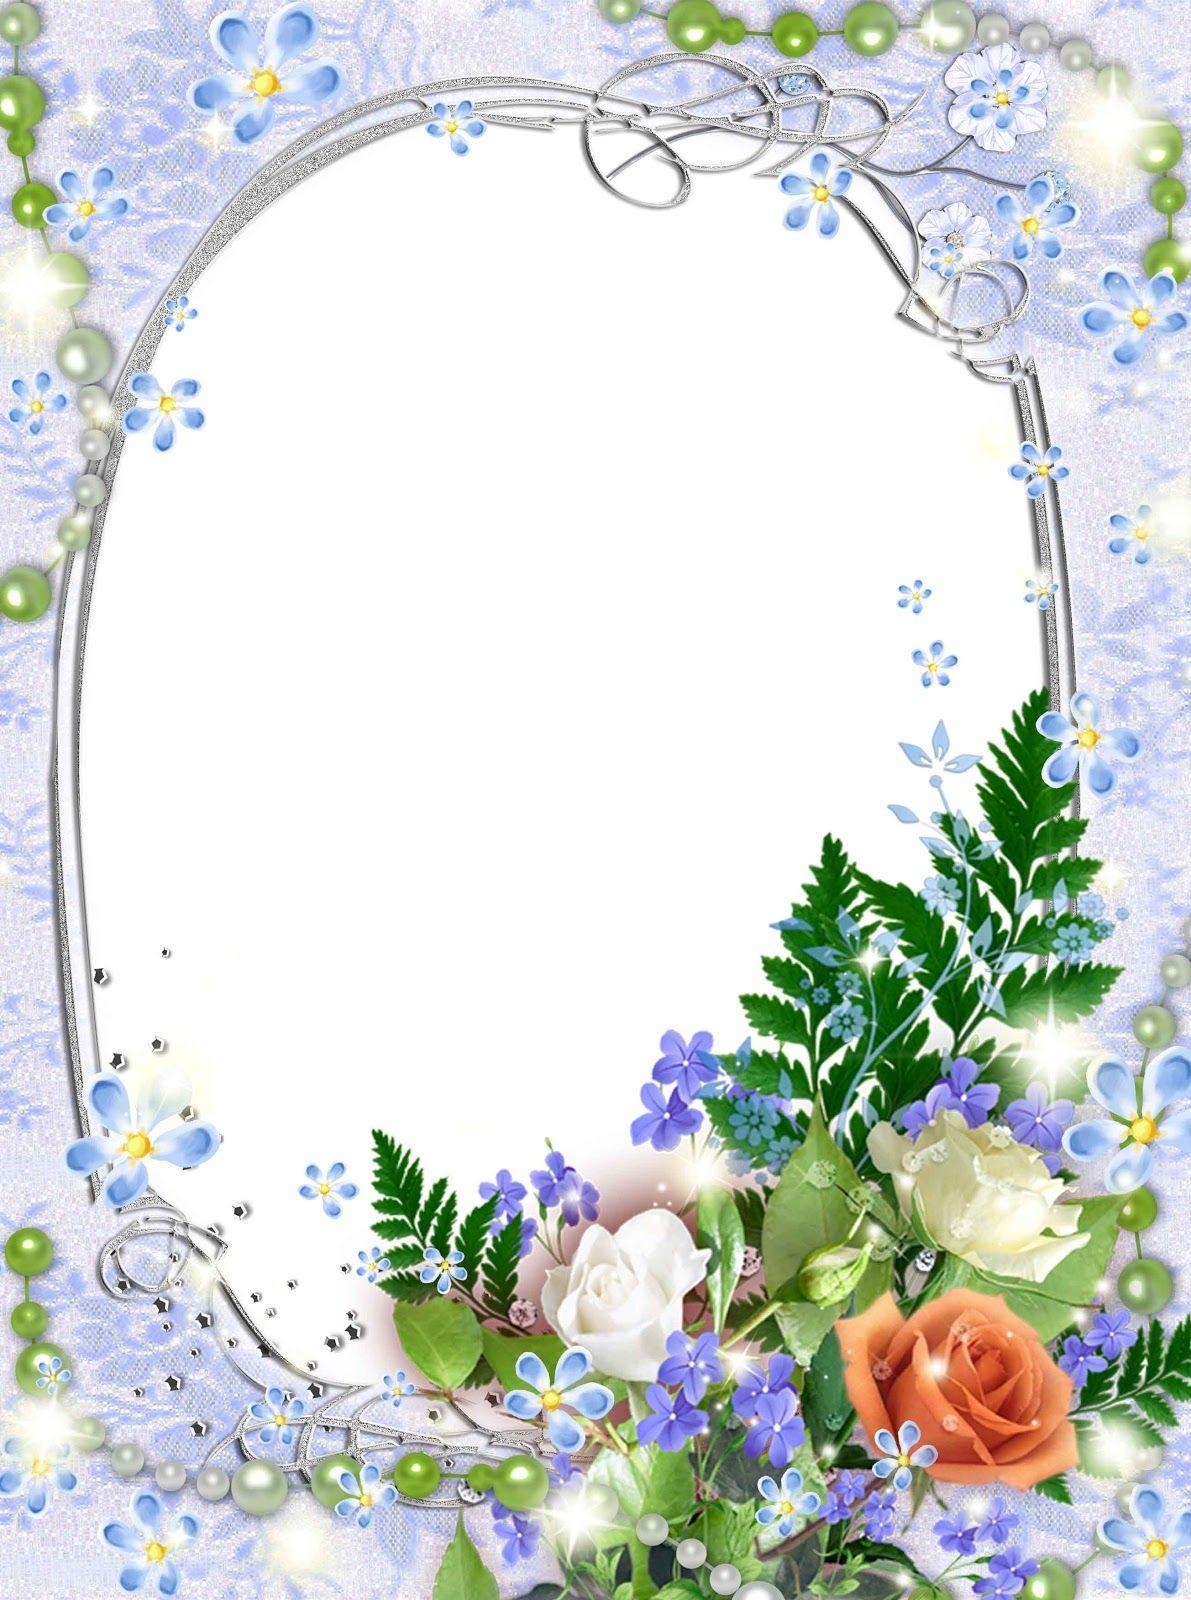 flowerphotoframespsdfreedownload3 frames and